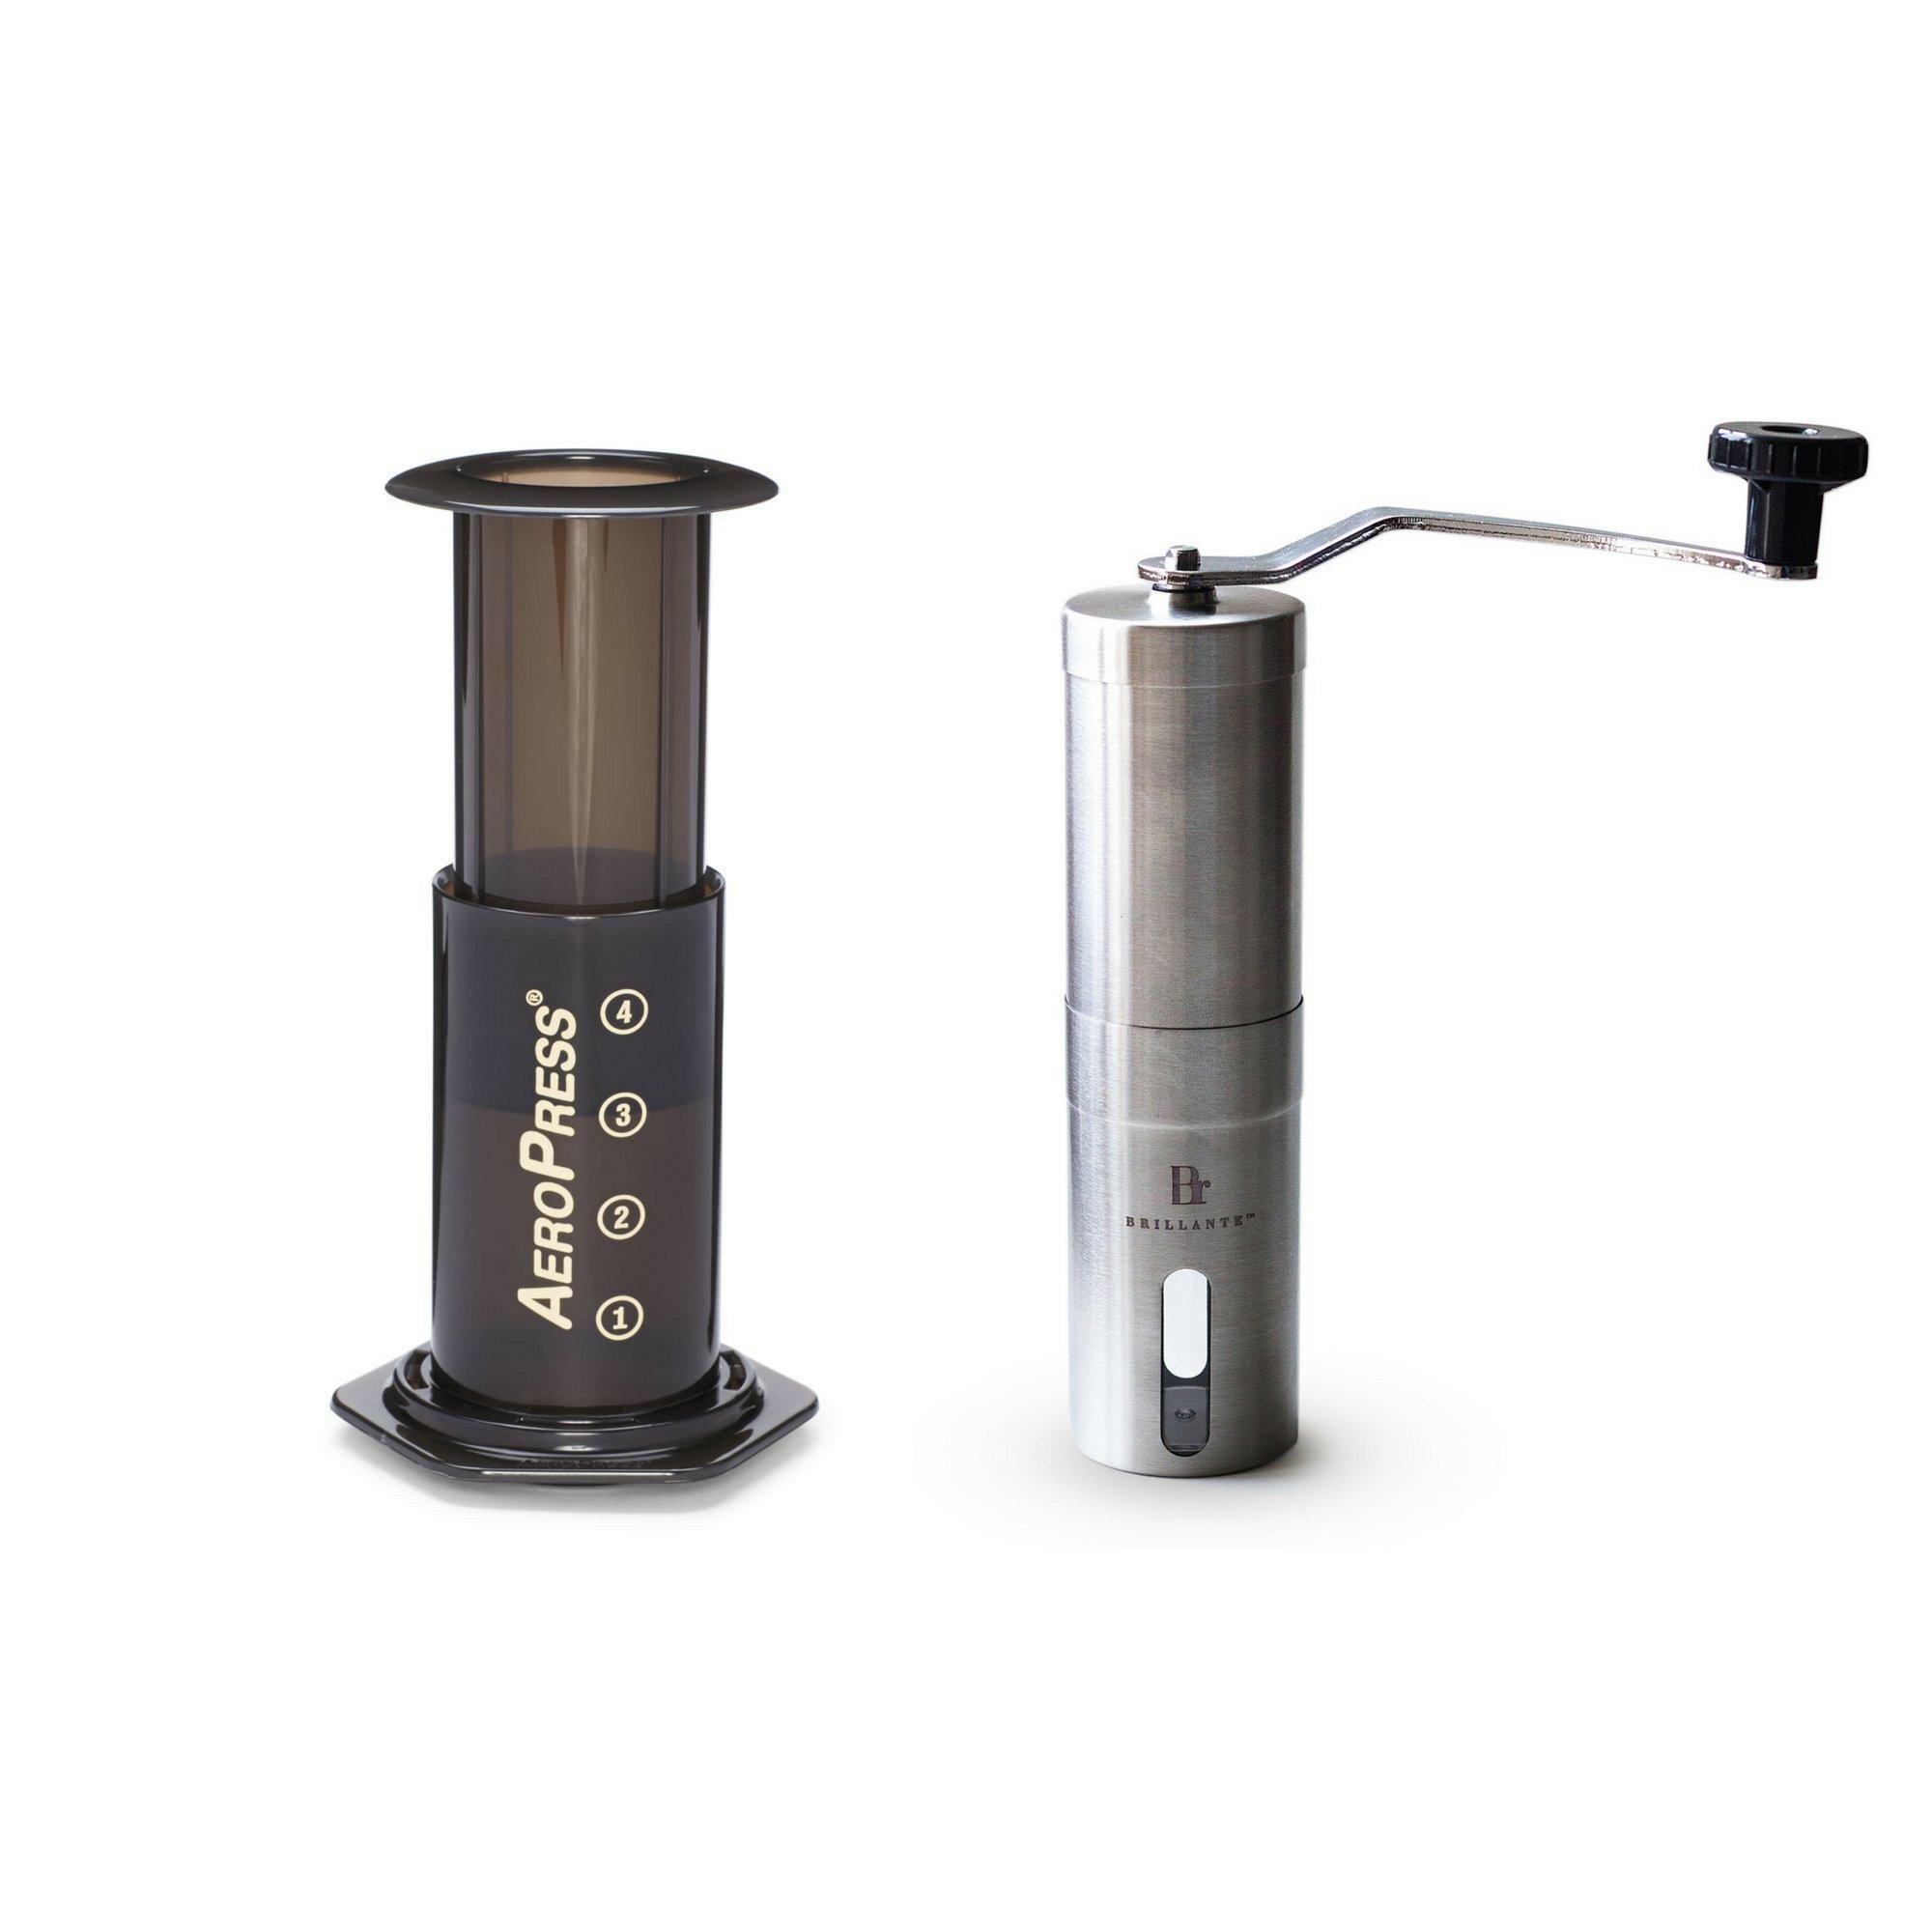 Aerobie AeroPress Coffee Maker with Brillante Manual Burr Coffee Grinder - Espresso Making Kit/Set